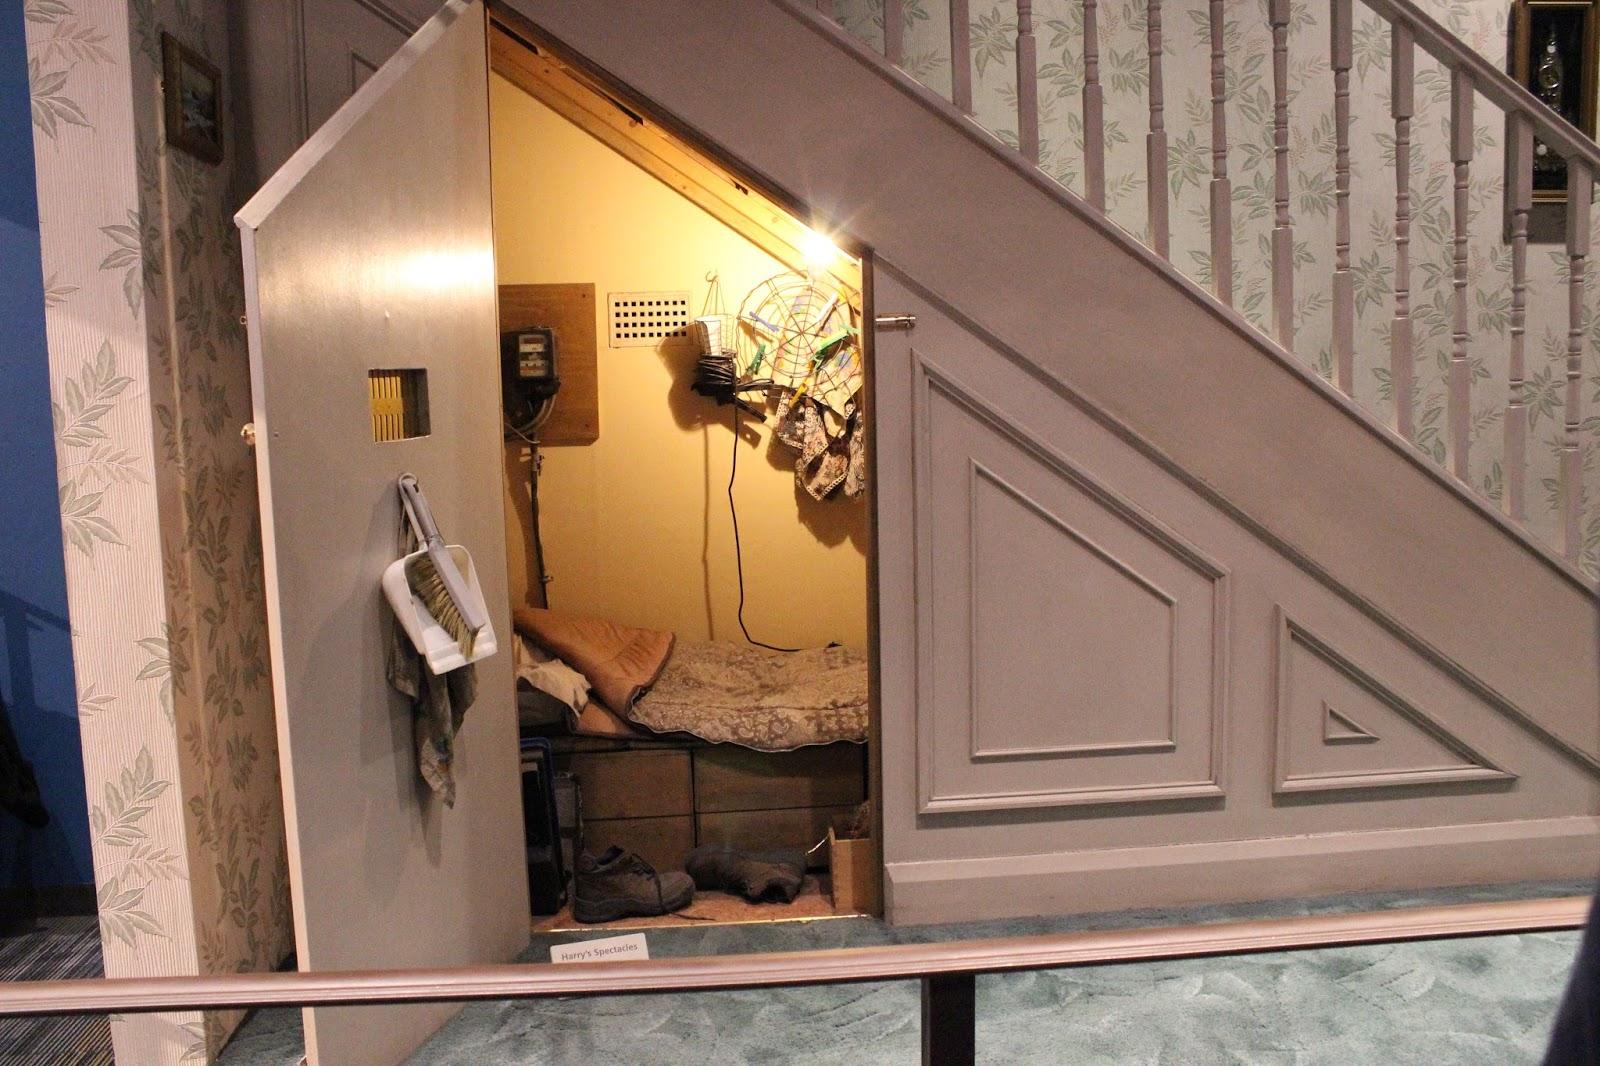 Dilys eikelboom warner bros harry potter studio tour - Office outs onder de trap ...